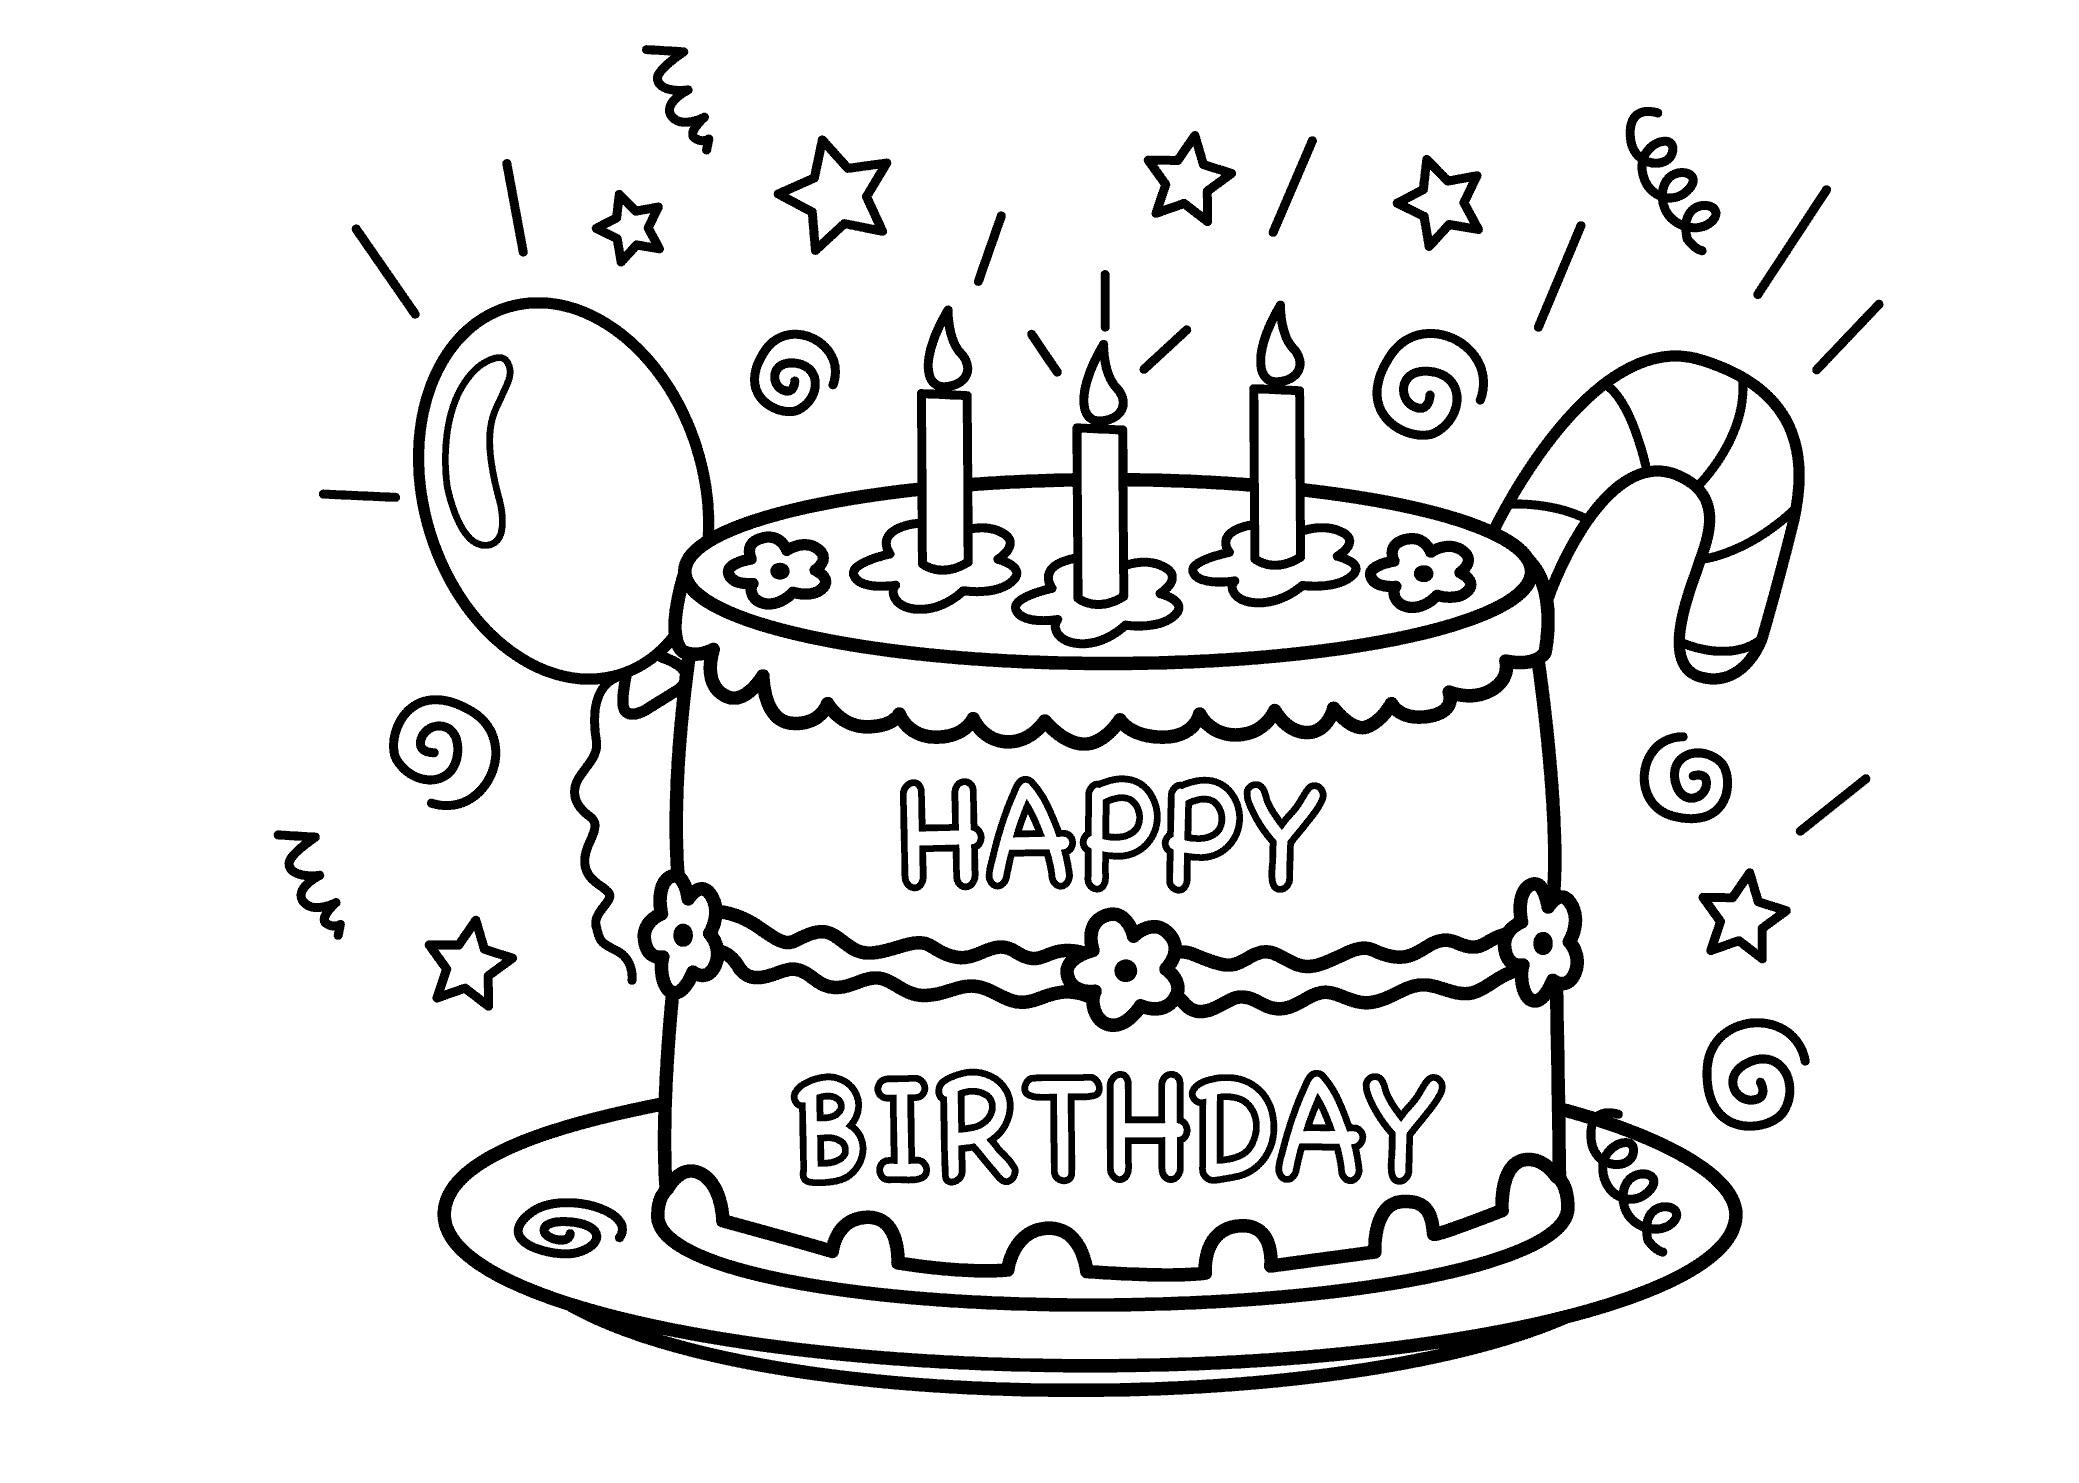 Color clipart birthday Happy 1361 Birthday 8 Lollipop